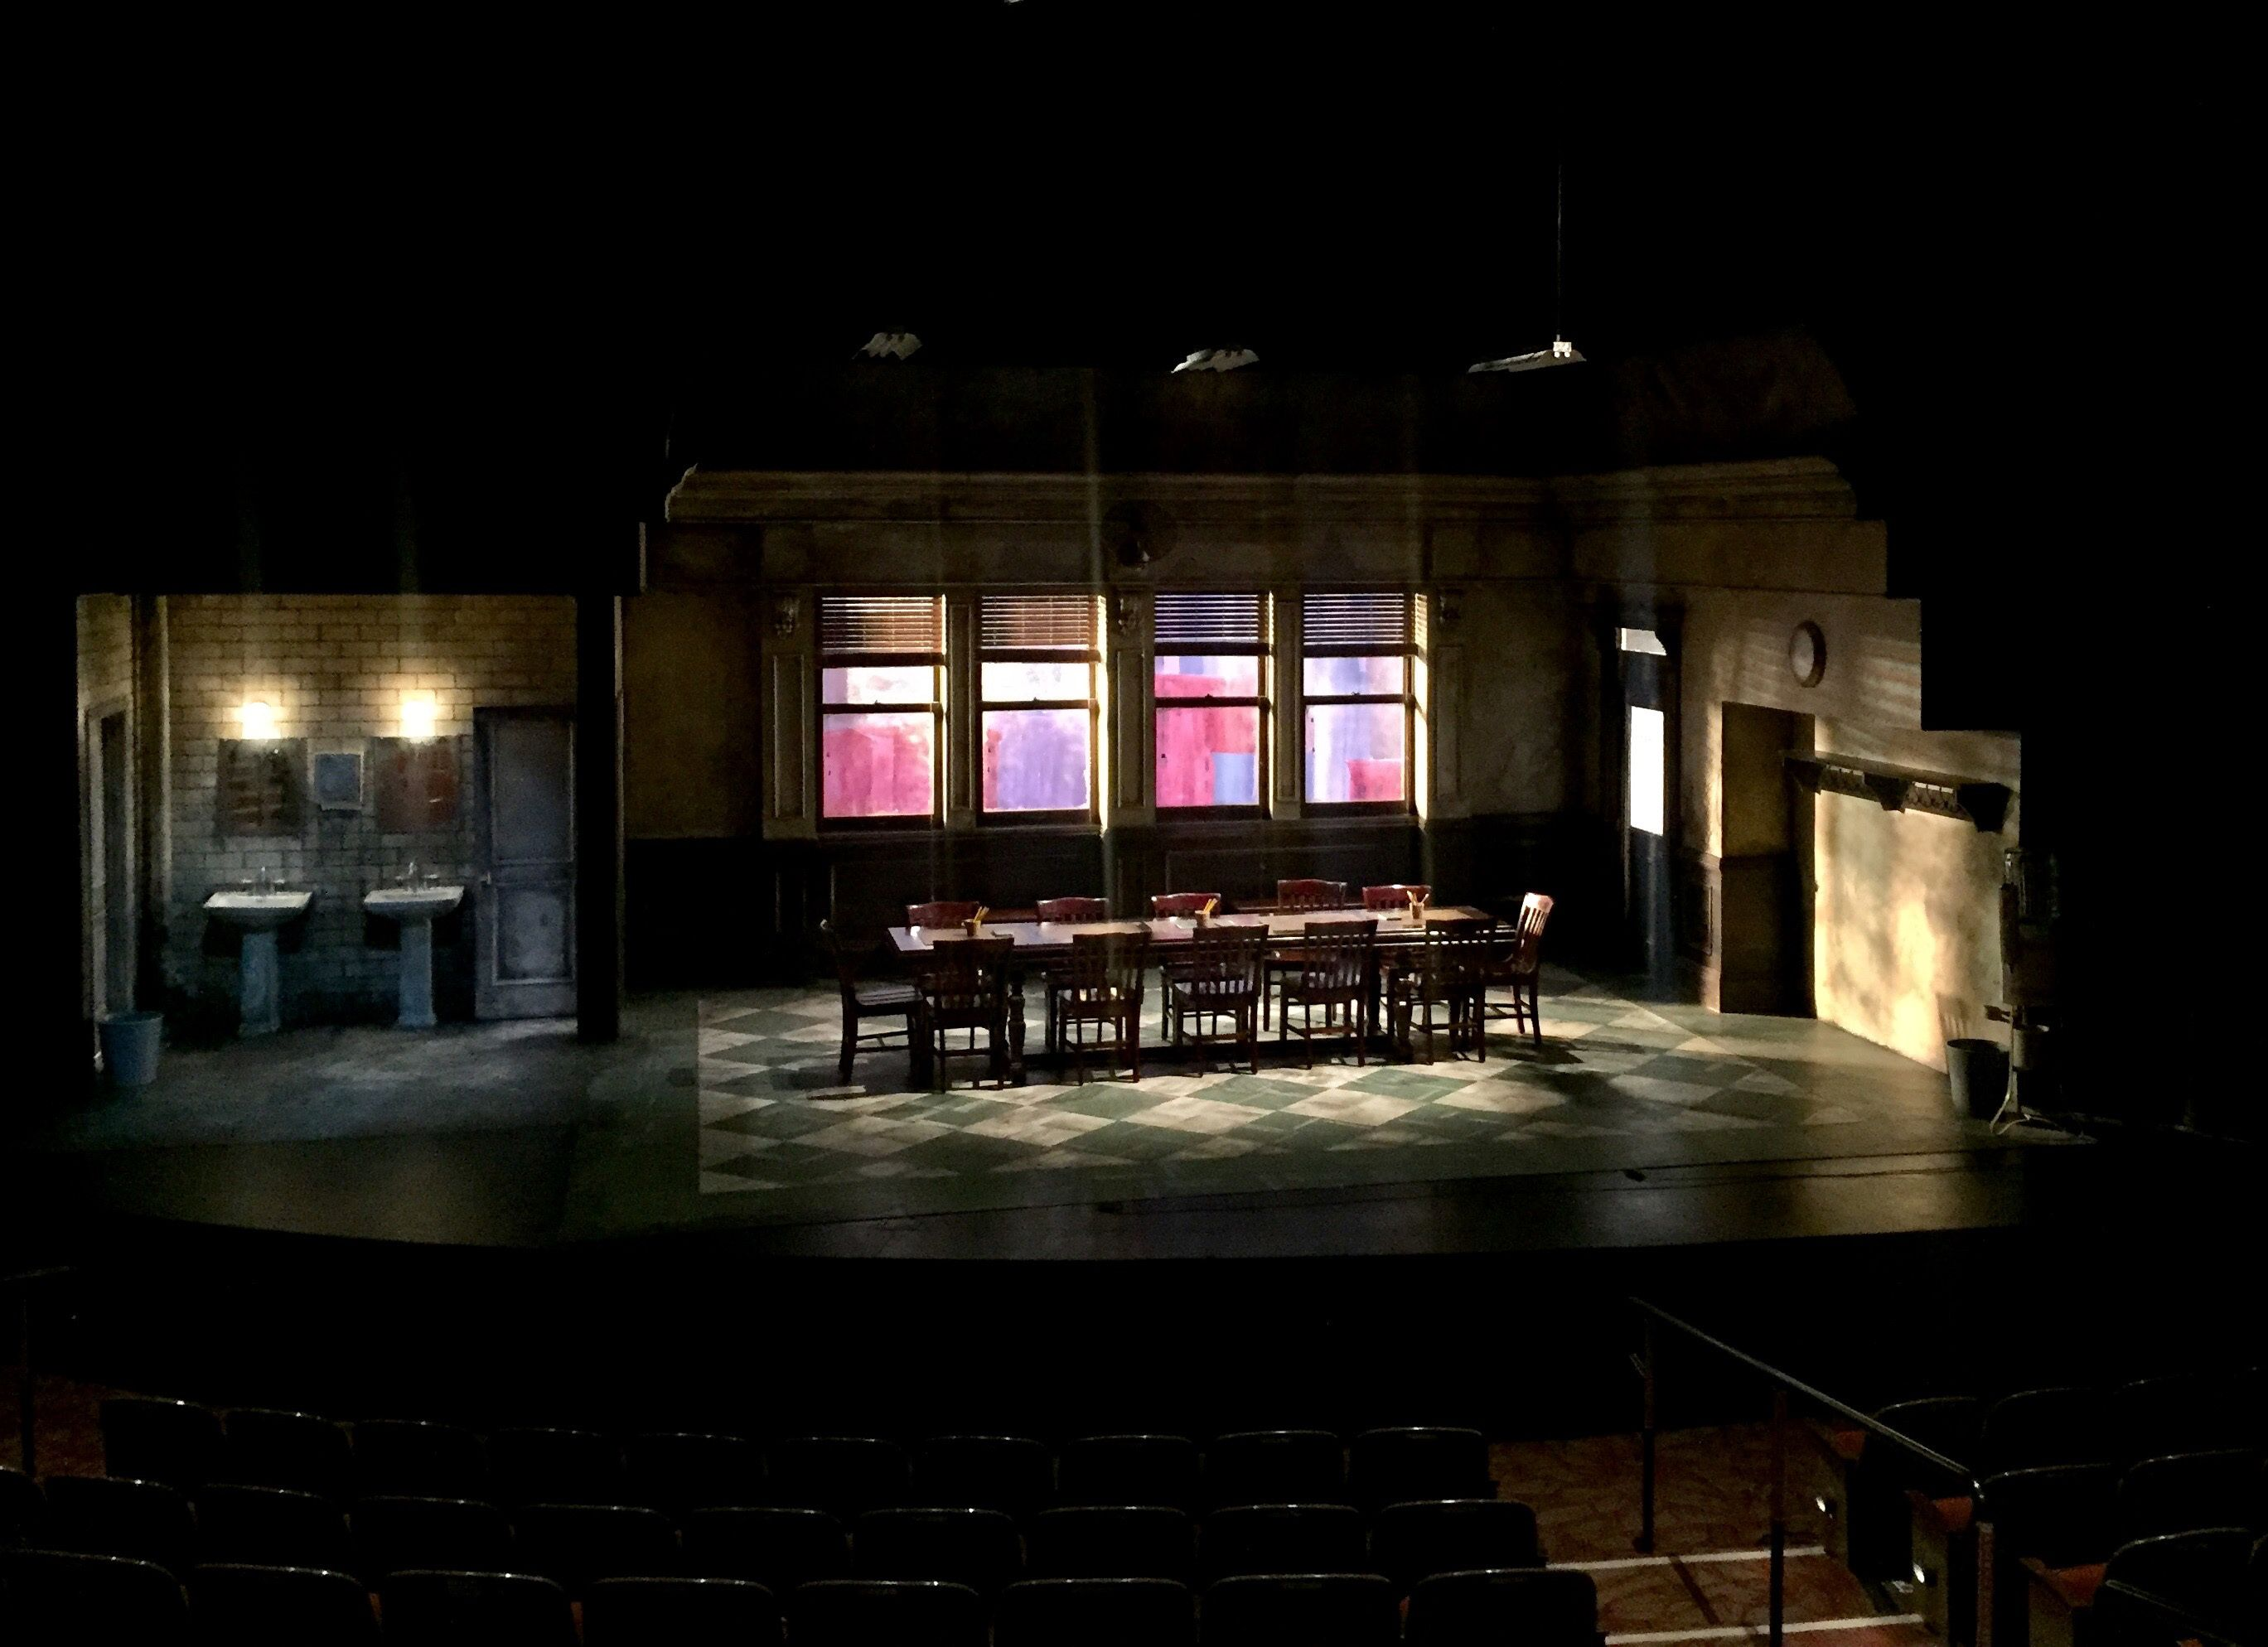 12 ANGRY MEN presented by The Laguna Playhouse, Laguna Beach